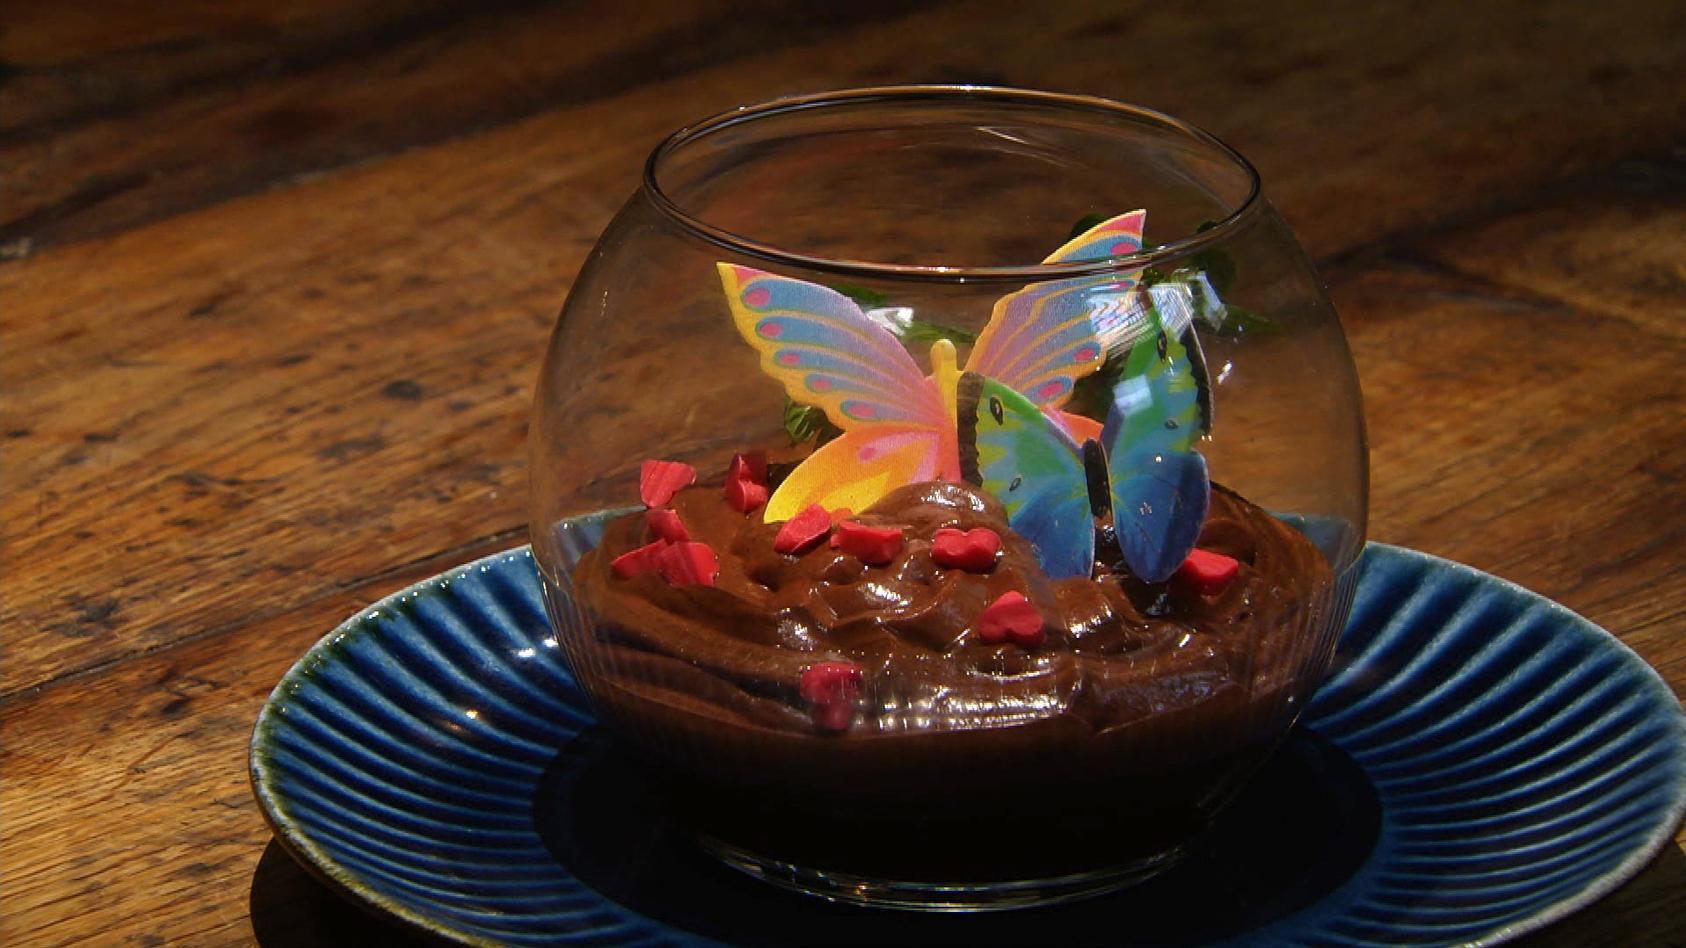 Romantisches Dinner – Liebe geht durch den Magen: Minz-Schokomousse